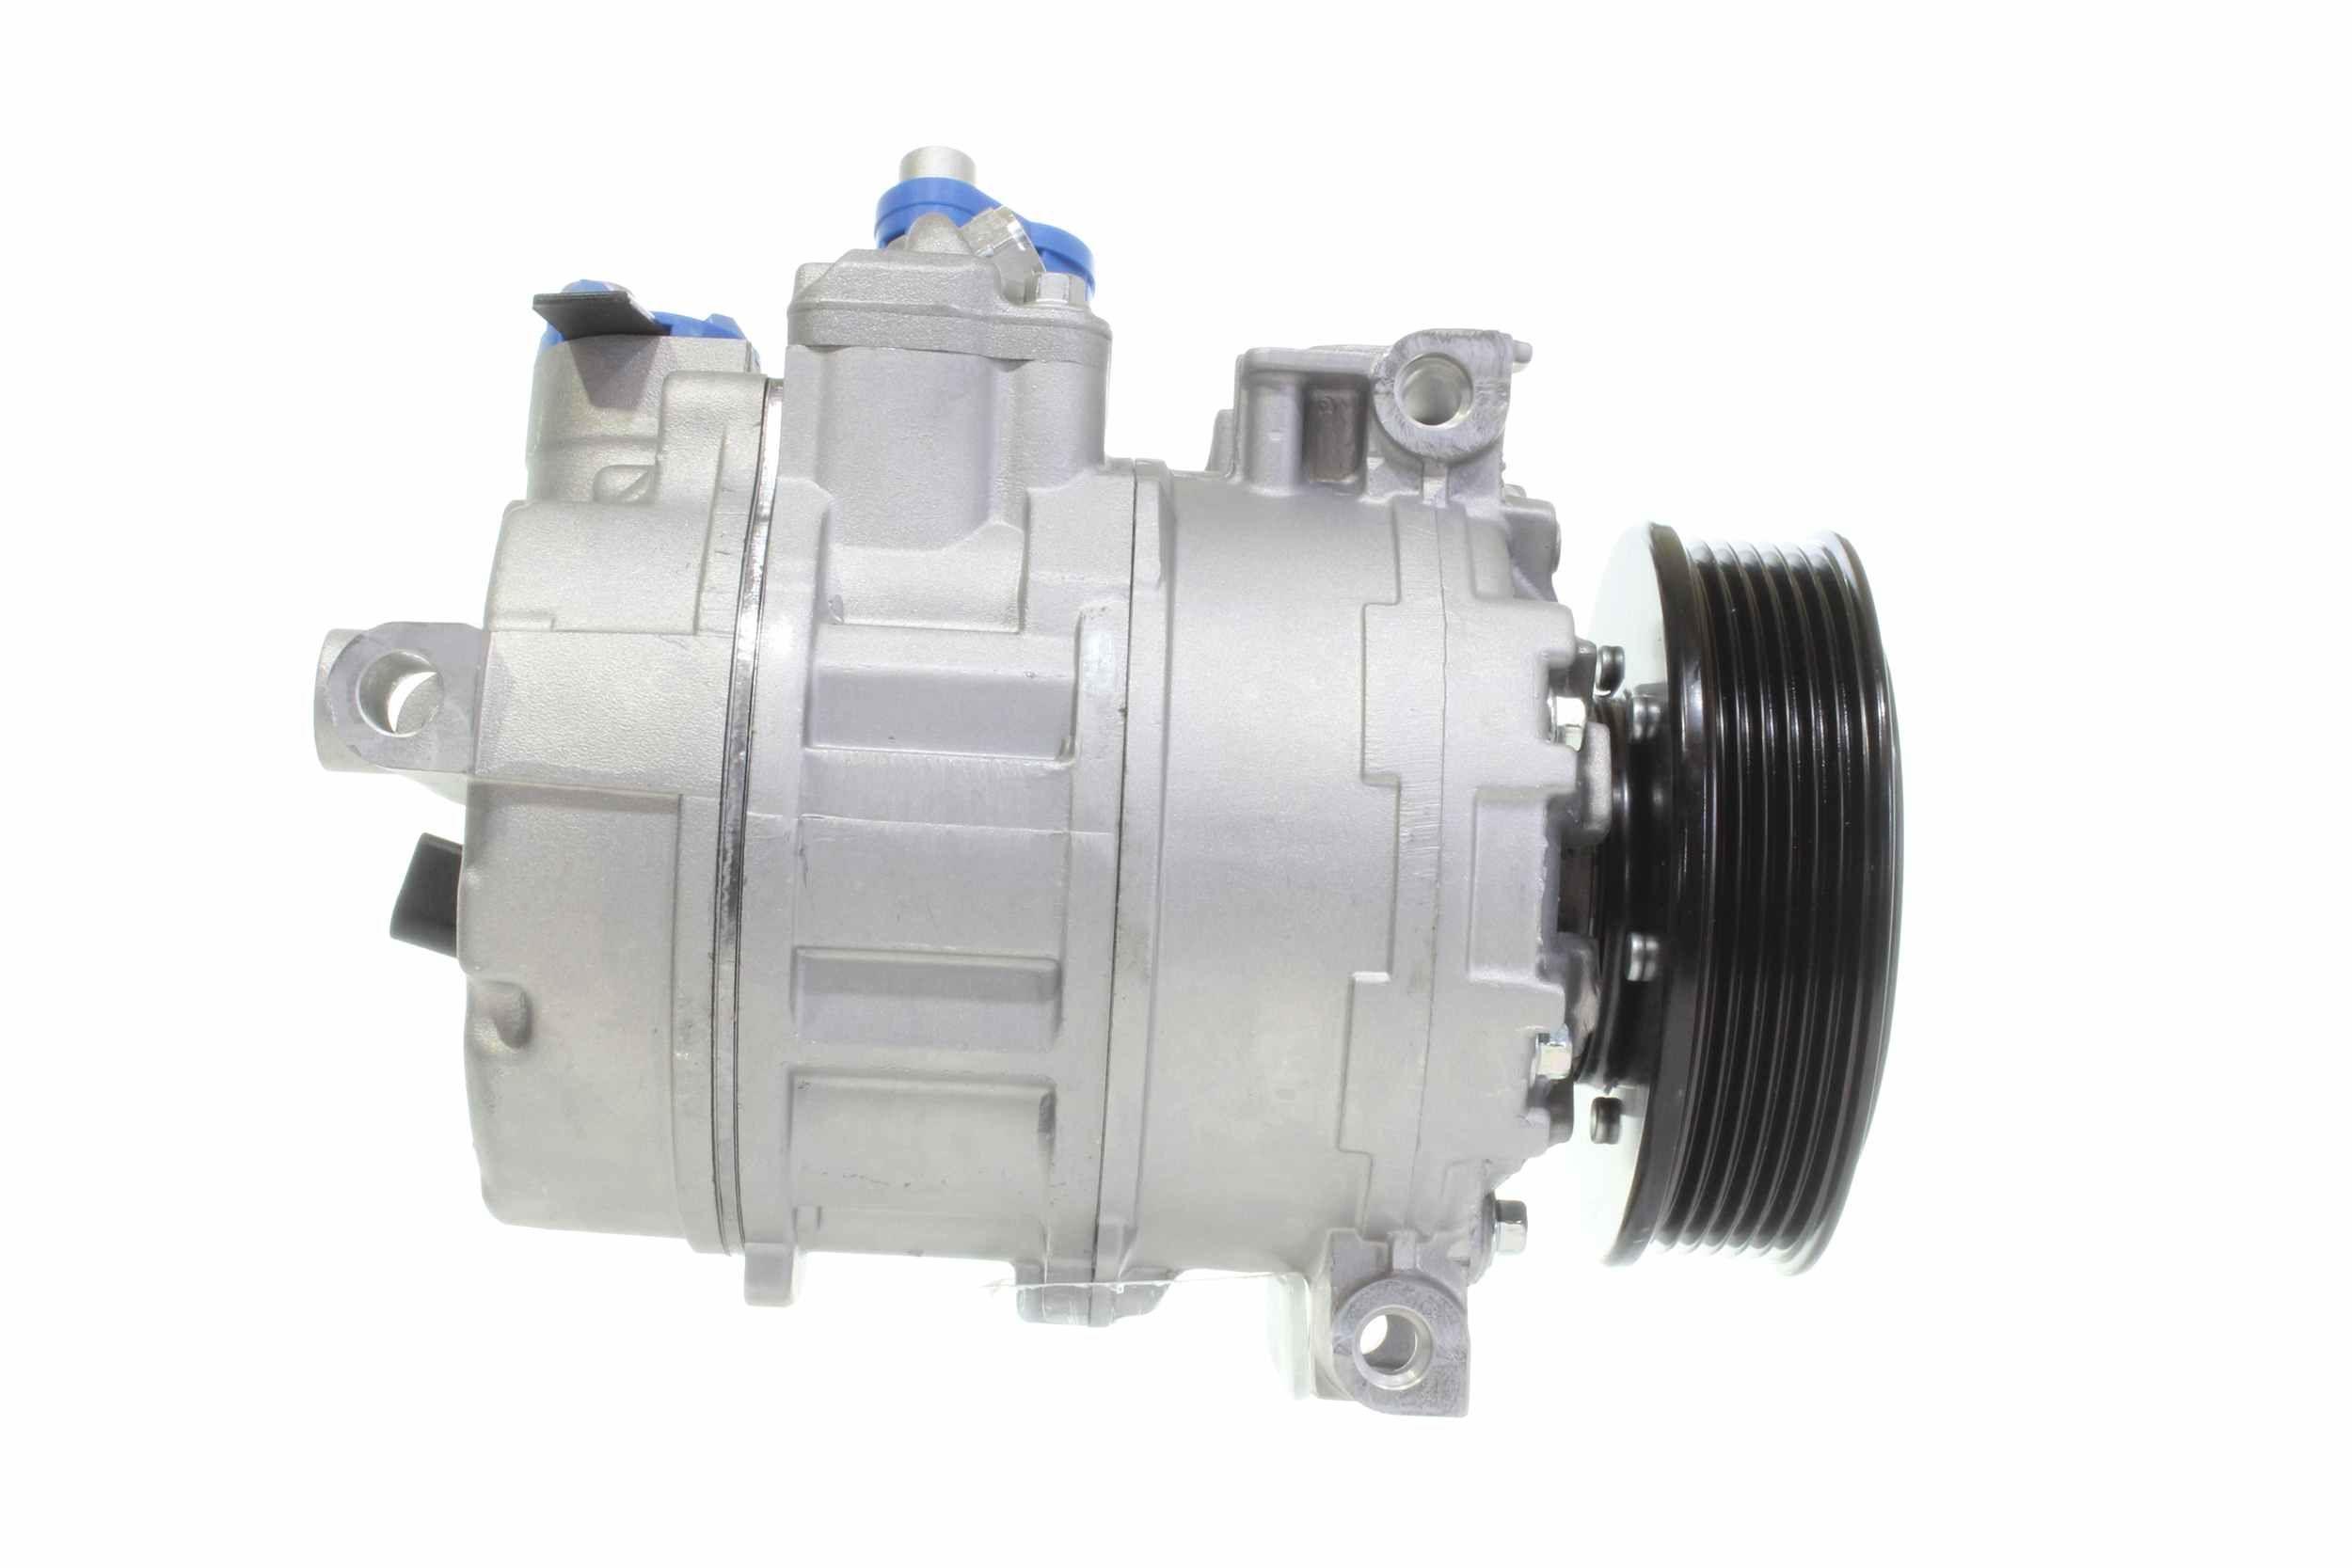 10550744 Klimaanlage Kompressor ALANKO - Markenprodukte billig